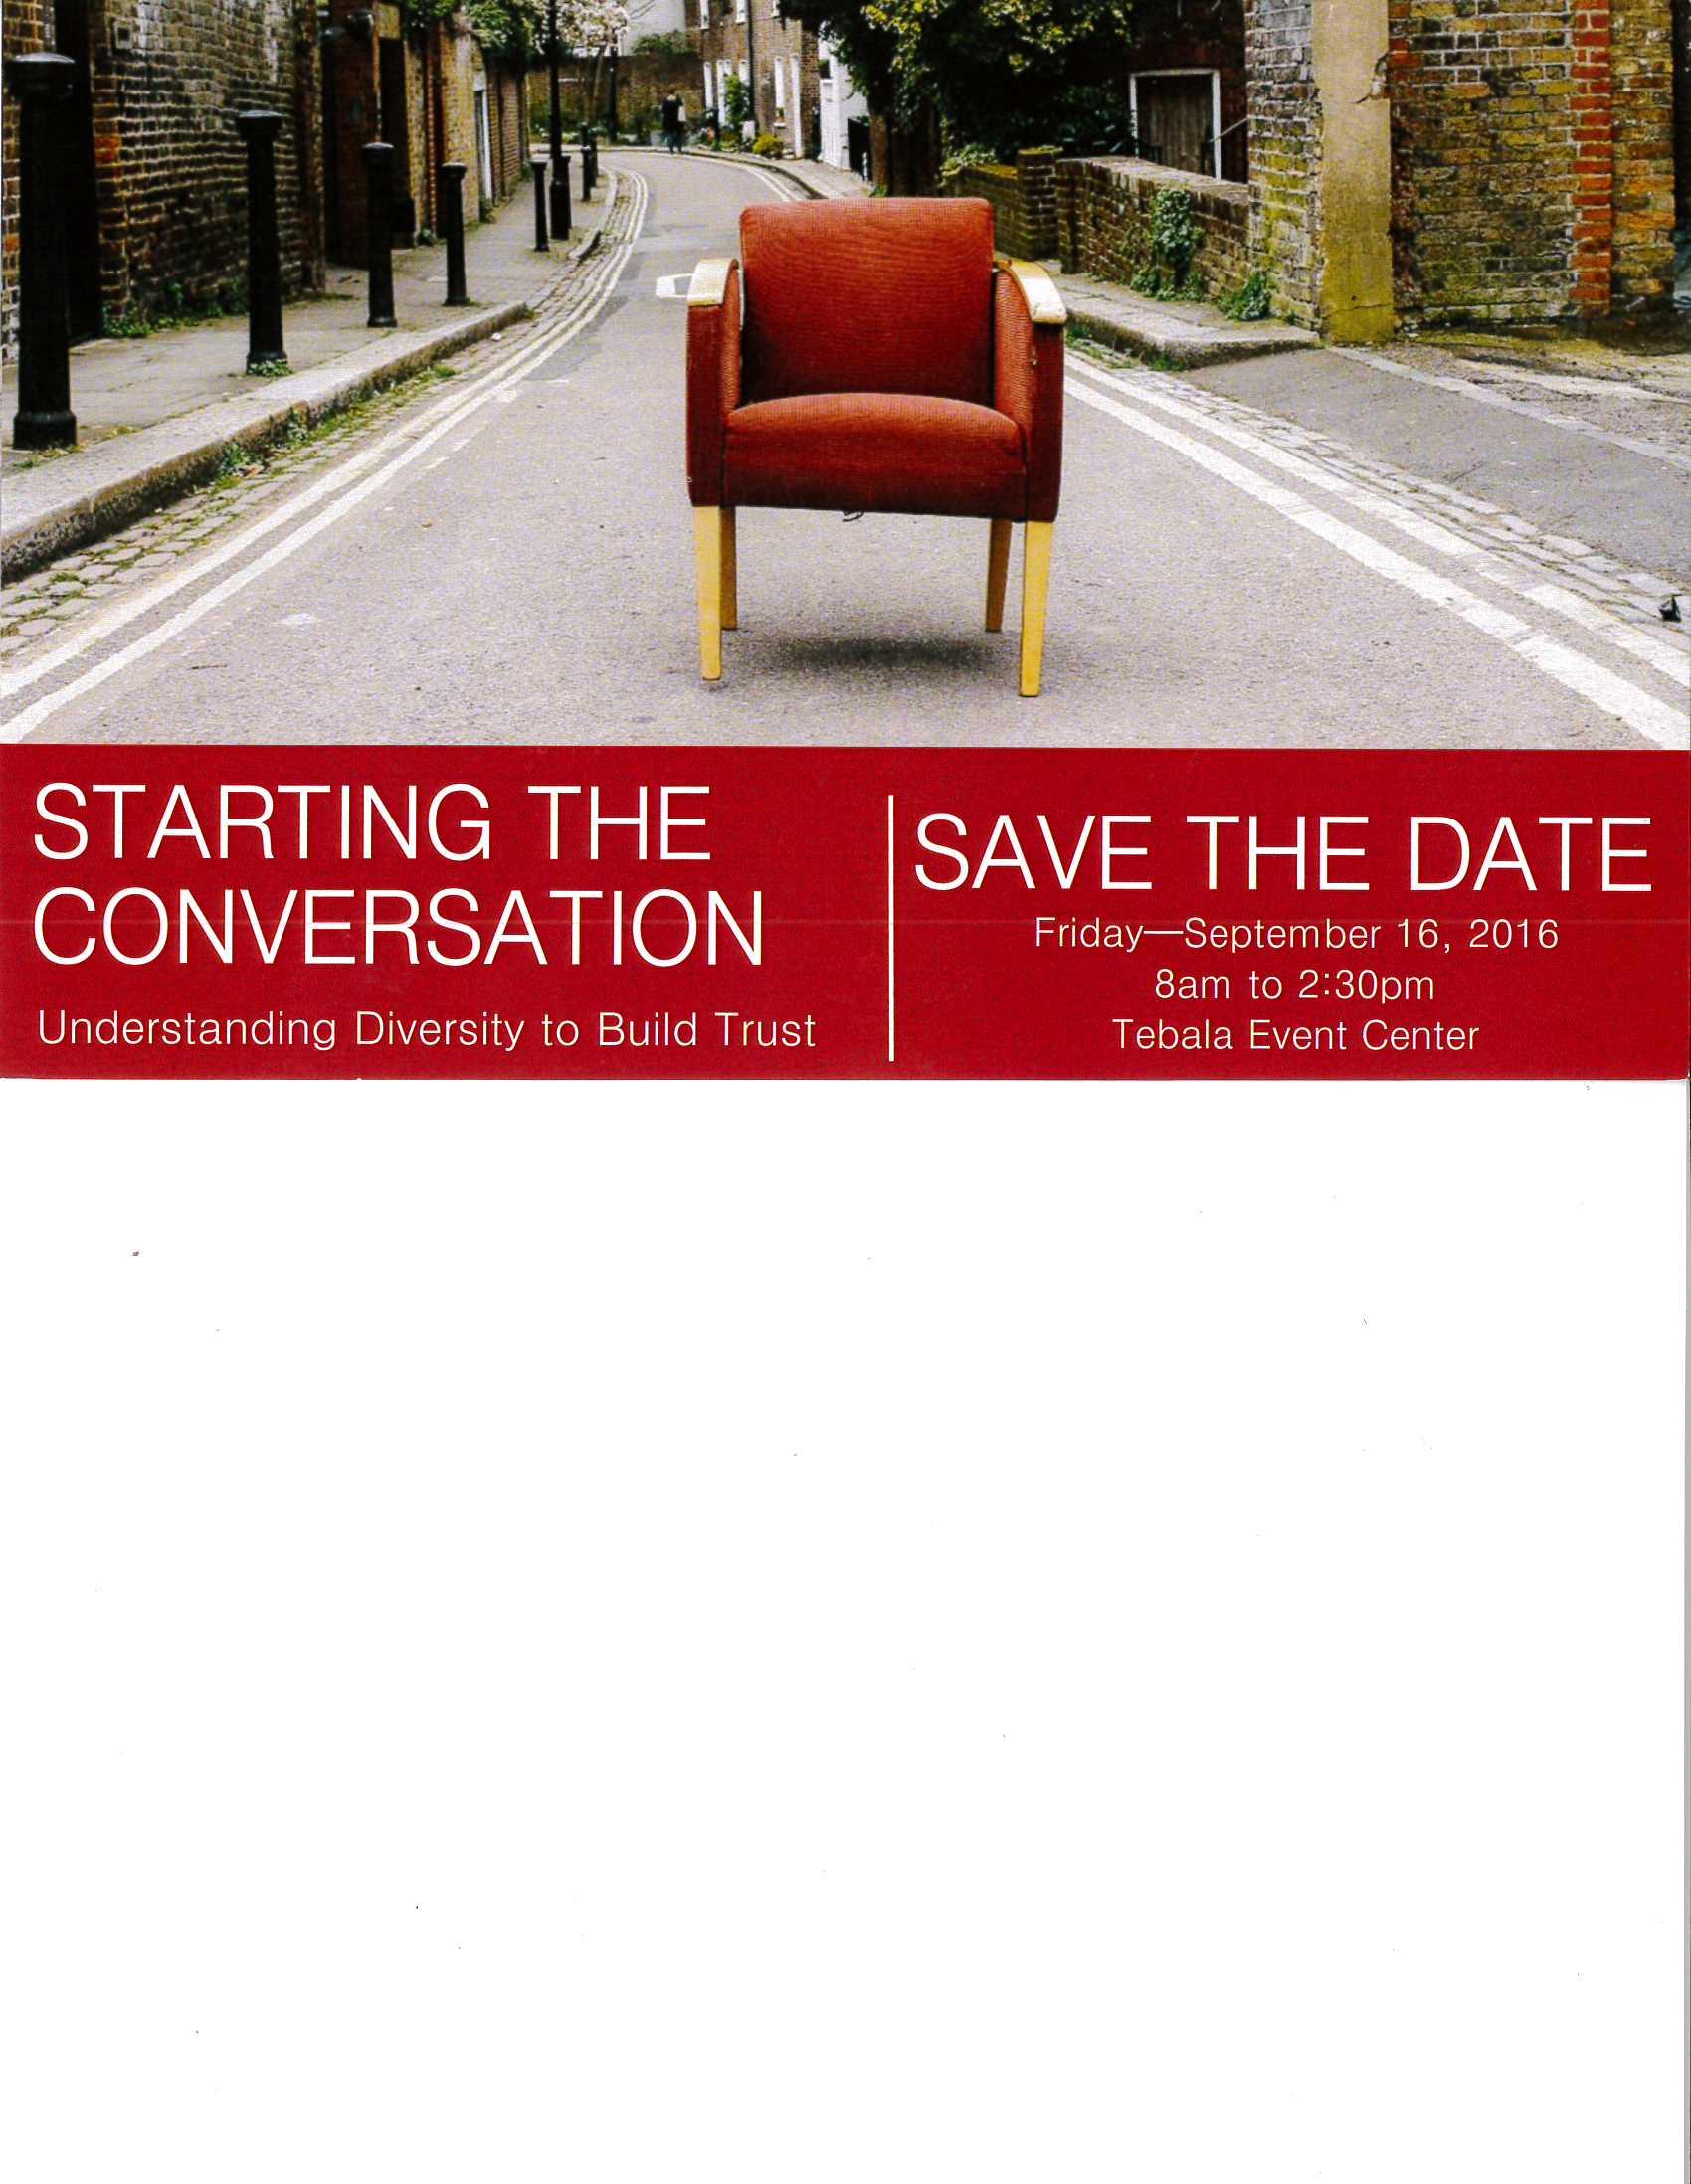 Starting the Conversation; Understanding Diversity to Build Trust